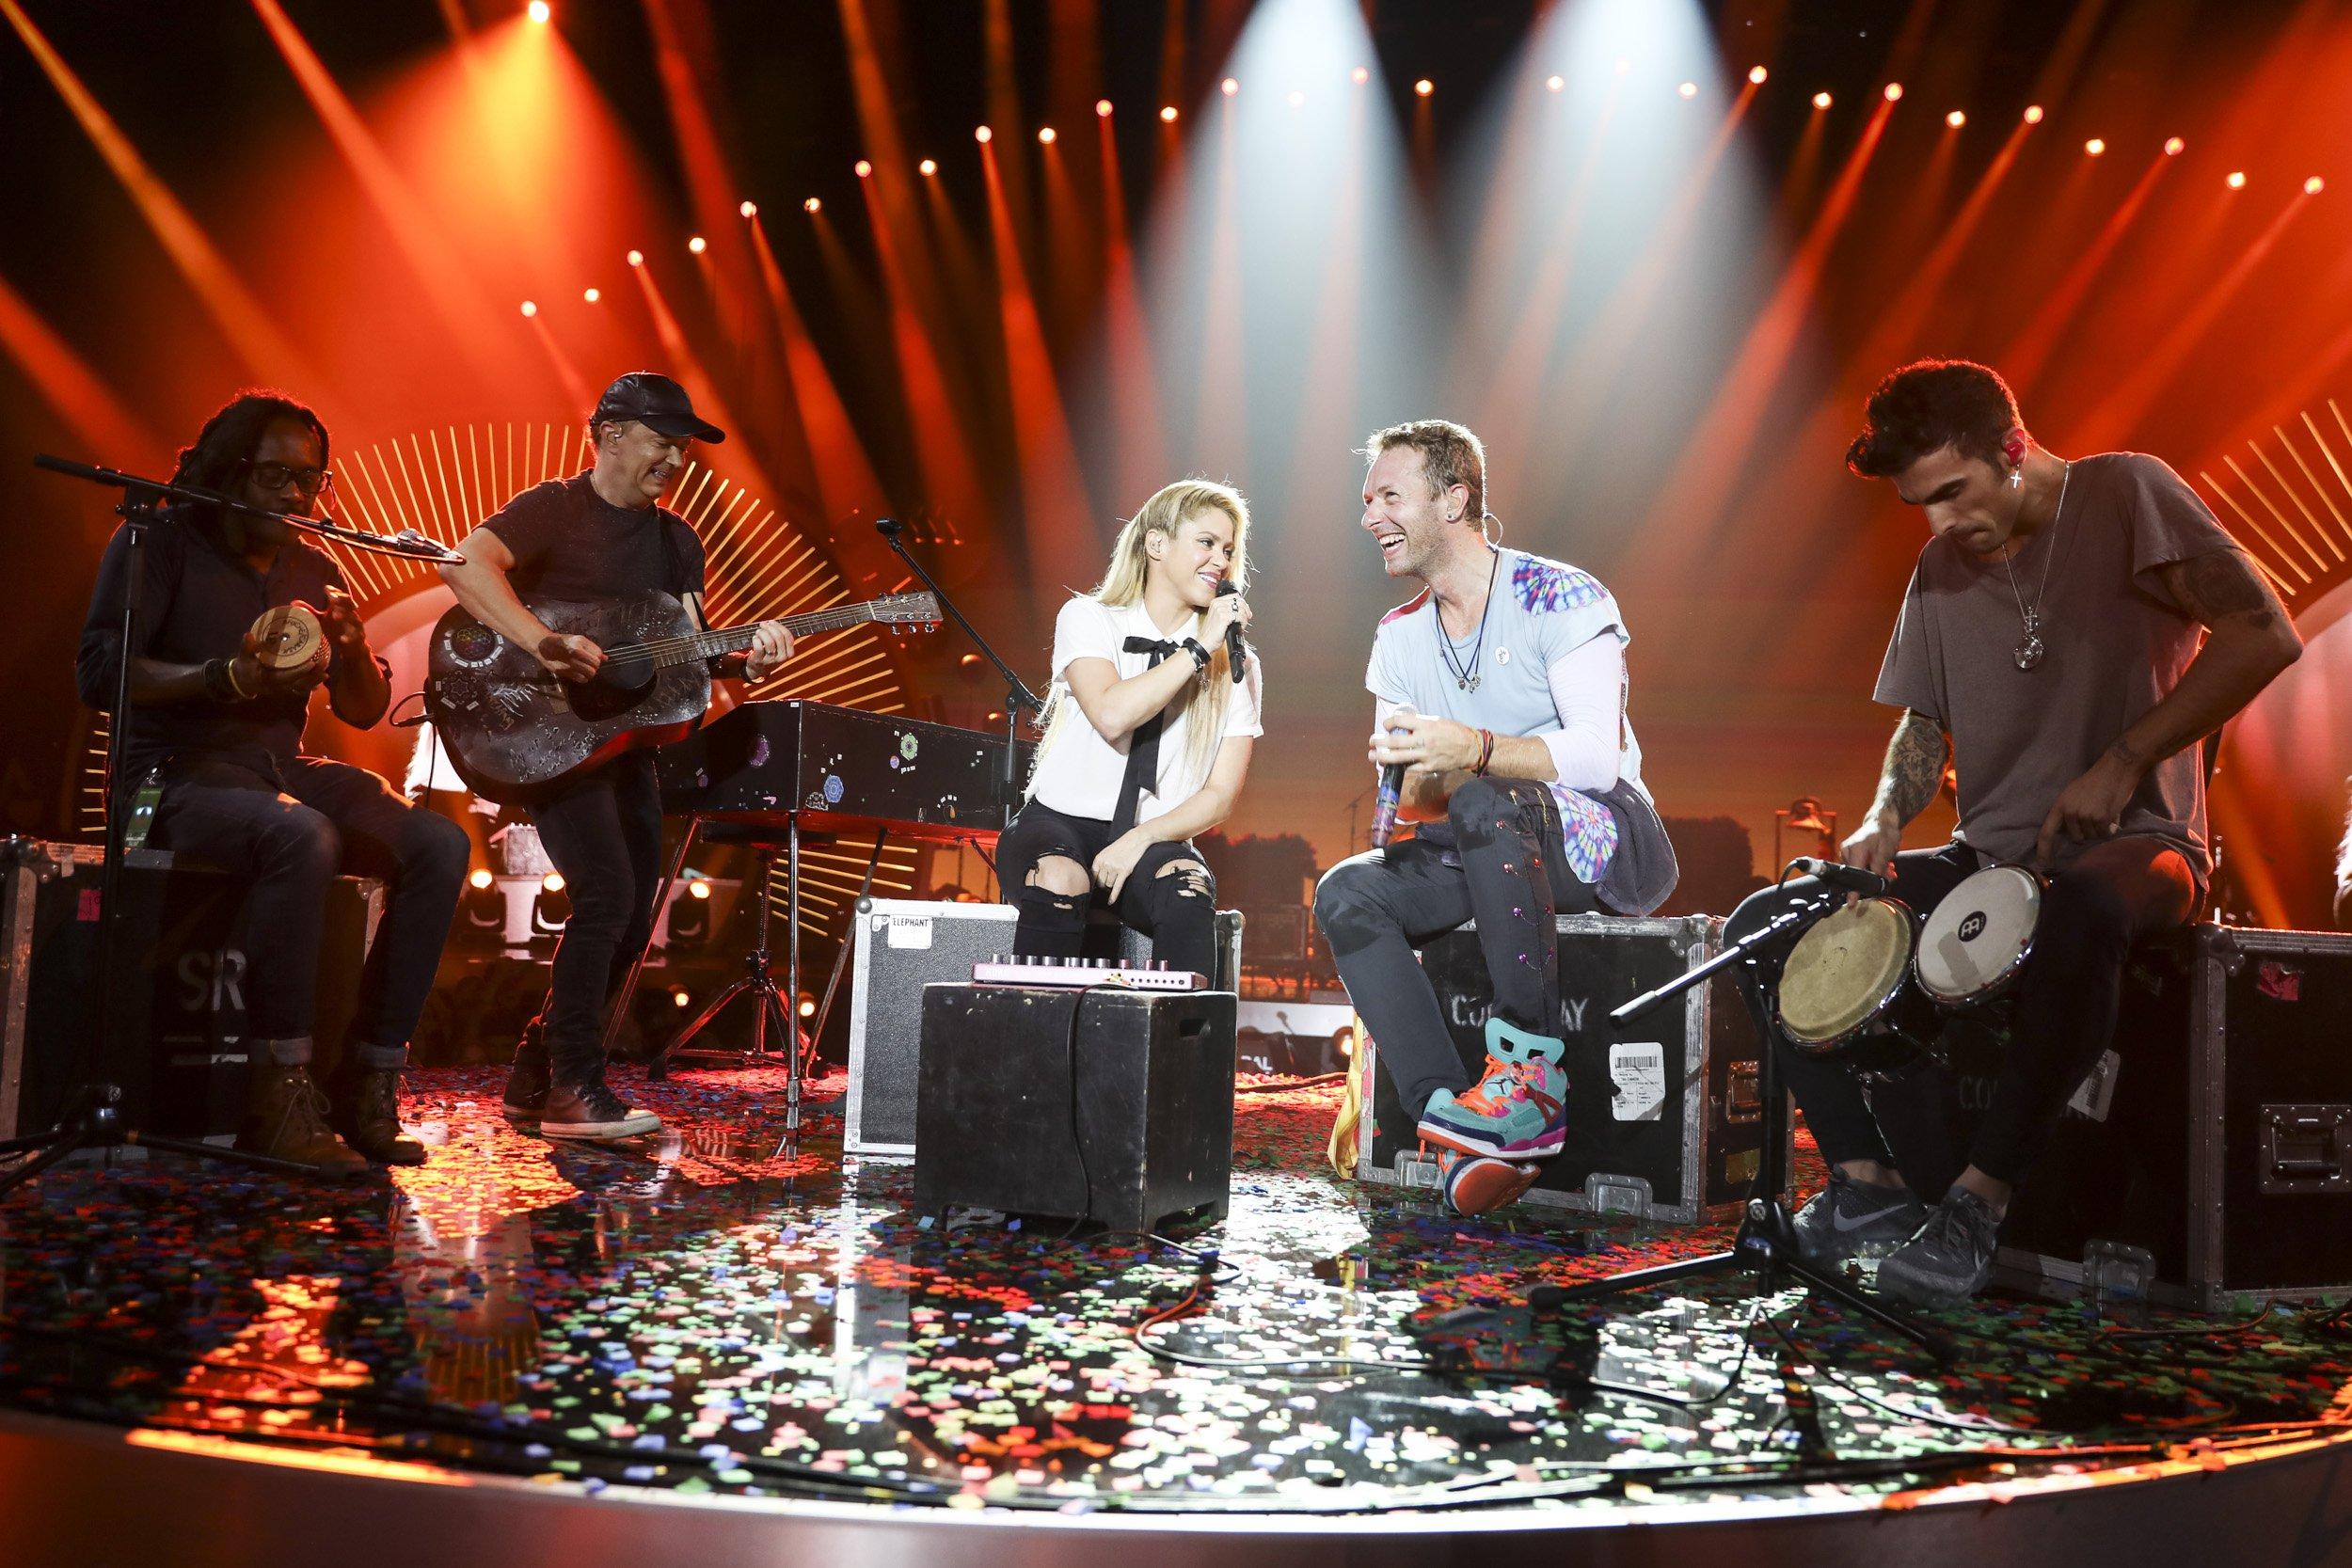 Hamburg_Coldplay_Shakira_GreyHuttonForGlobalCitizen_3 (1).jpg